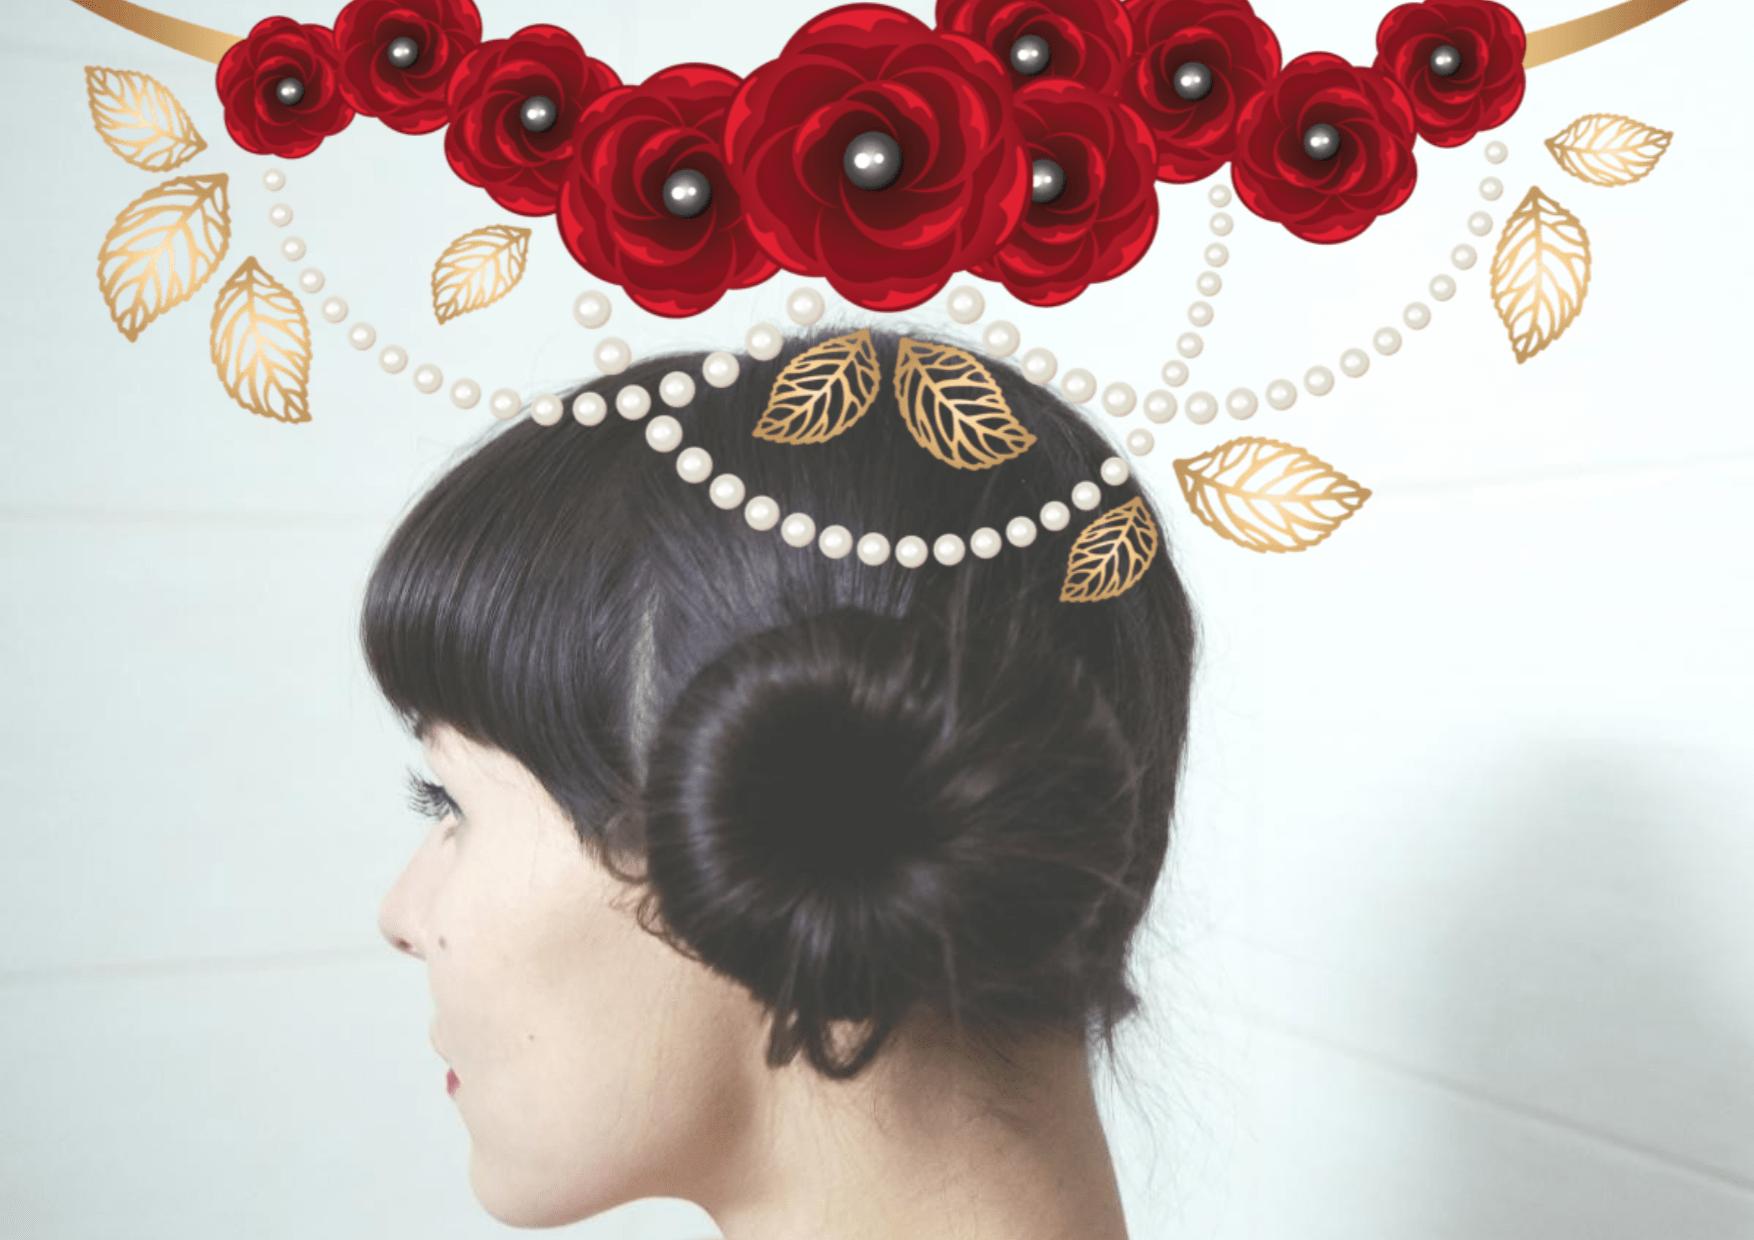 Clothing,                Jewellery,                Fashion,                Accessory,                Headpiece,                Hairstyle,                Image,                Avatar,                Love,                White,                Black,                 Free Image